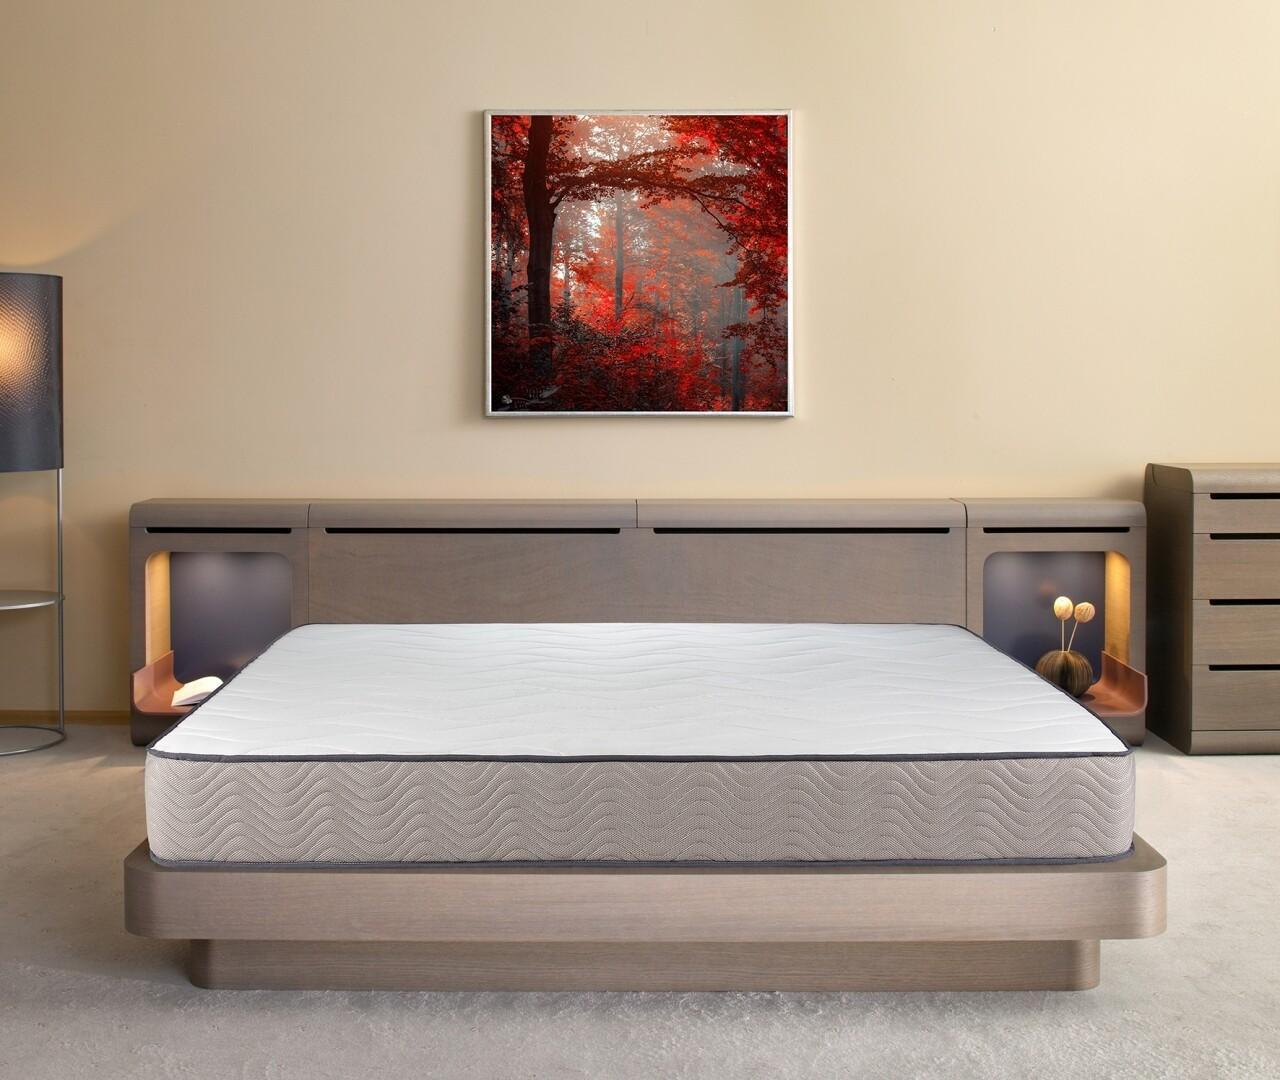 Saltea Bedora, Fresh Memory Grey Line, Ortopedica, Anatomica 140 x 200 cm